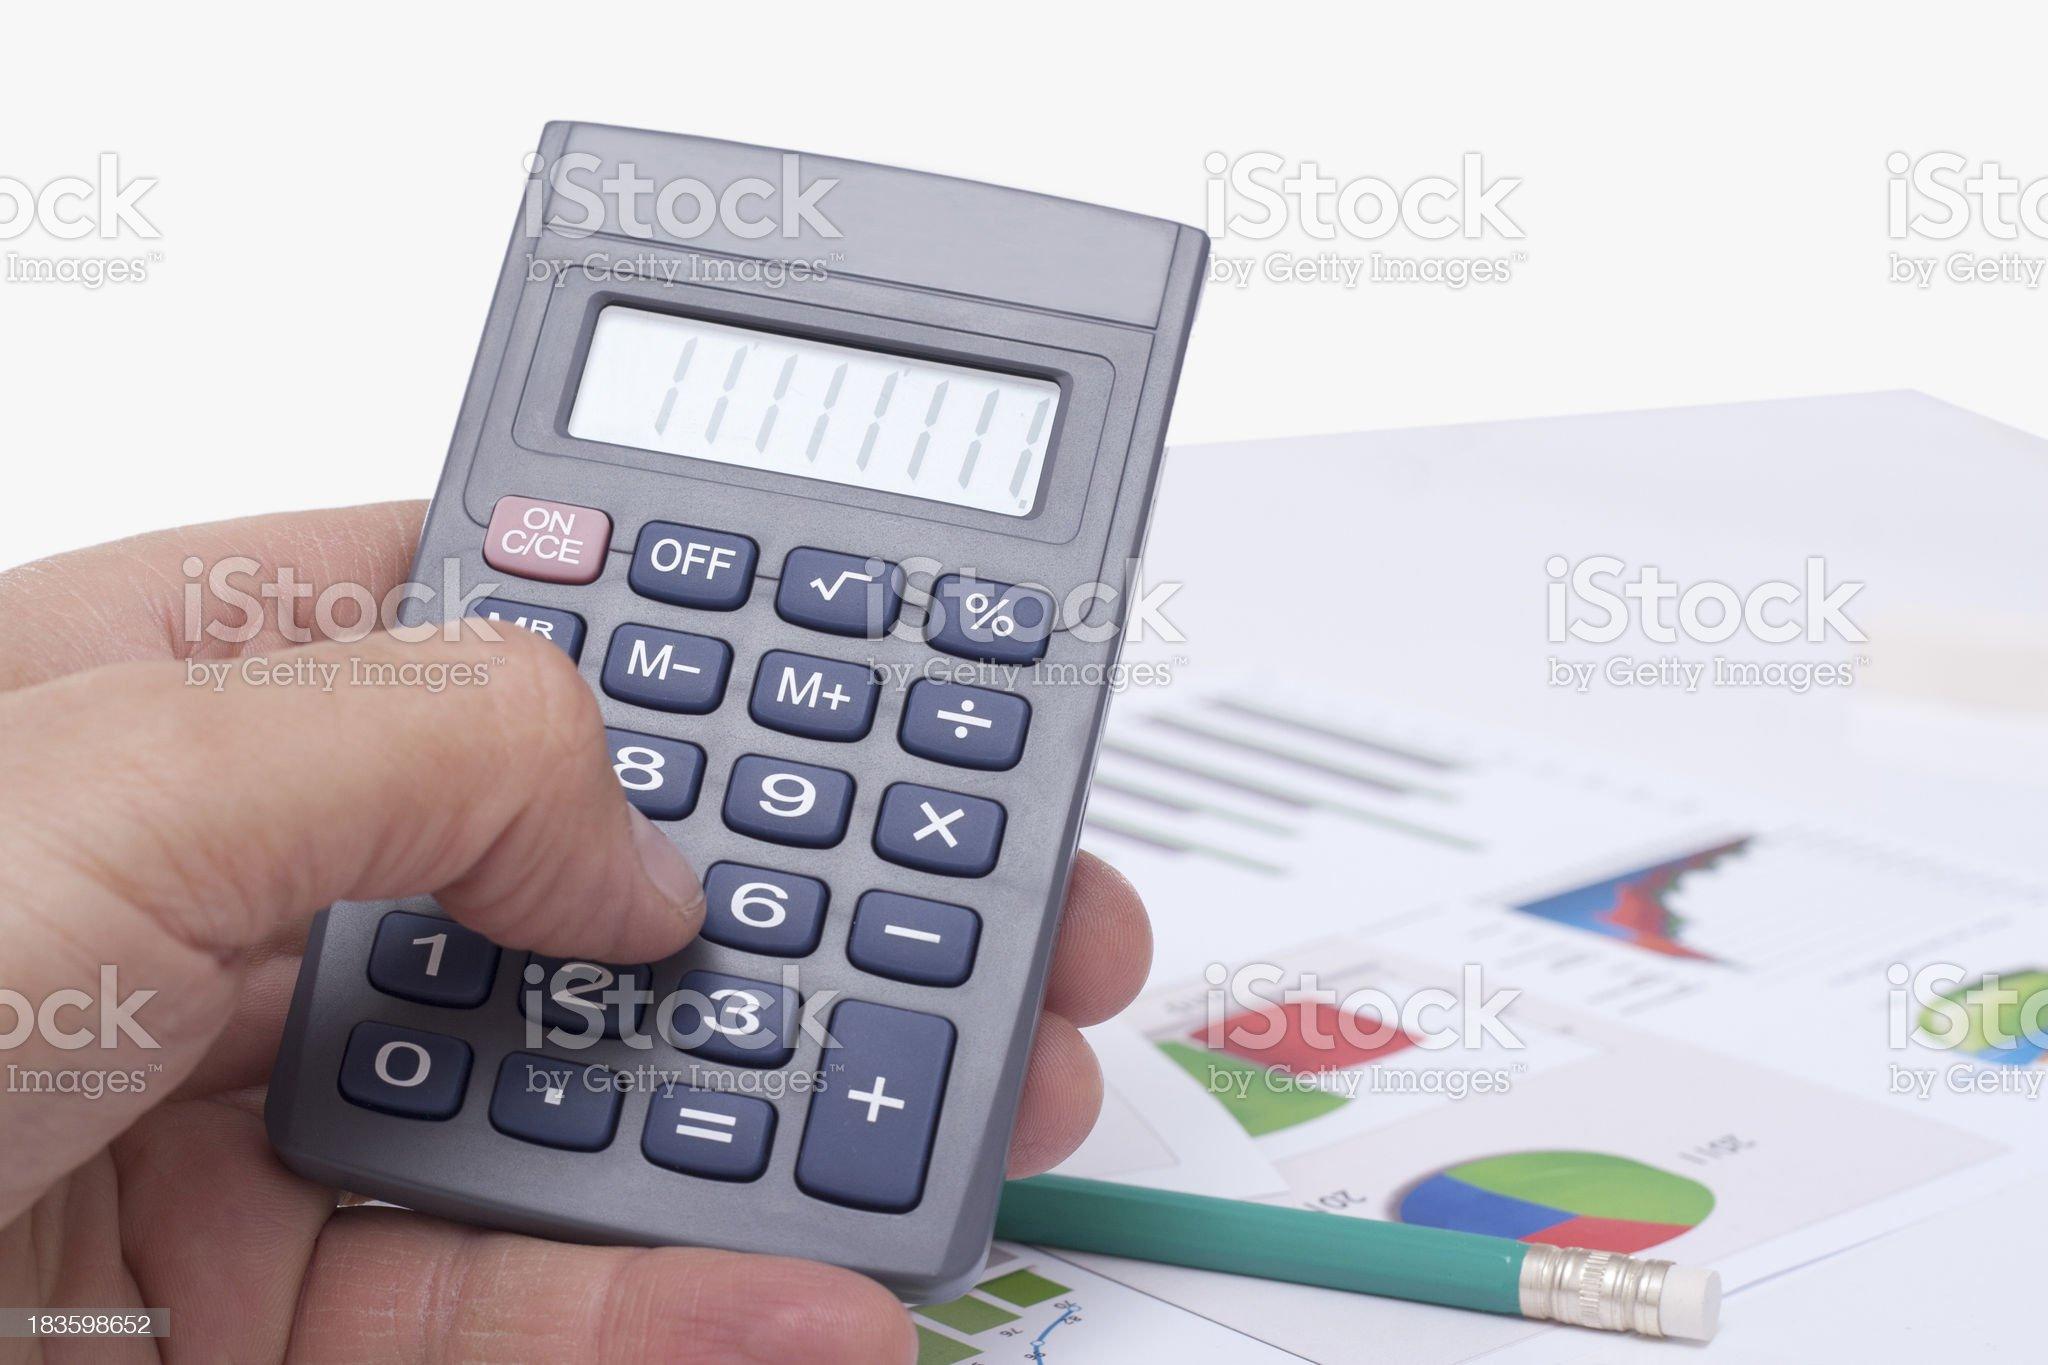 computing on the calculator royalty-free stock photo